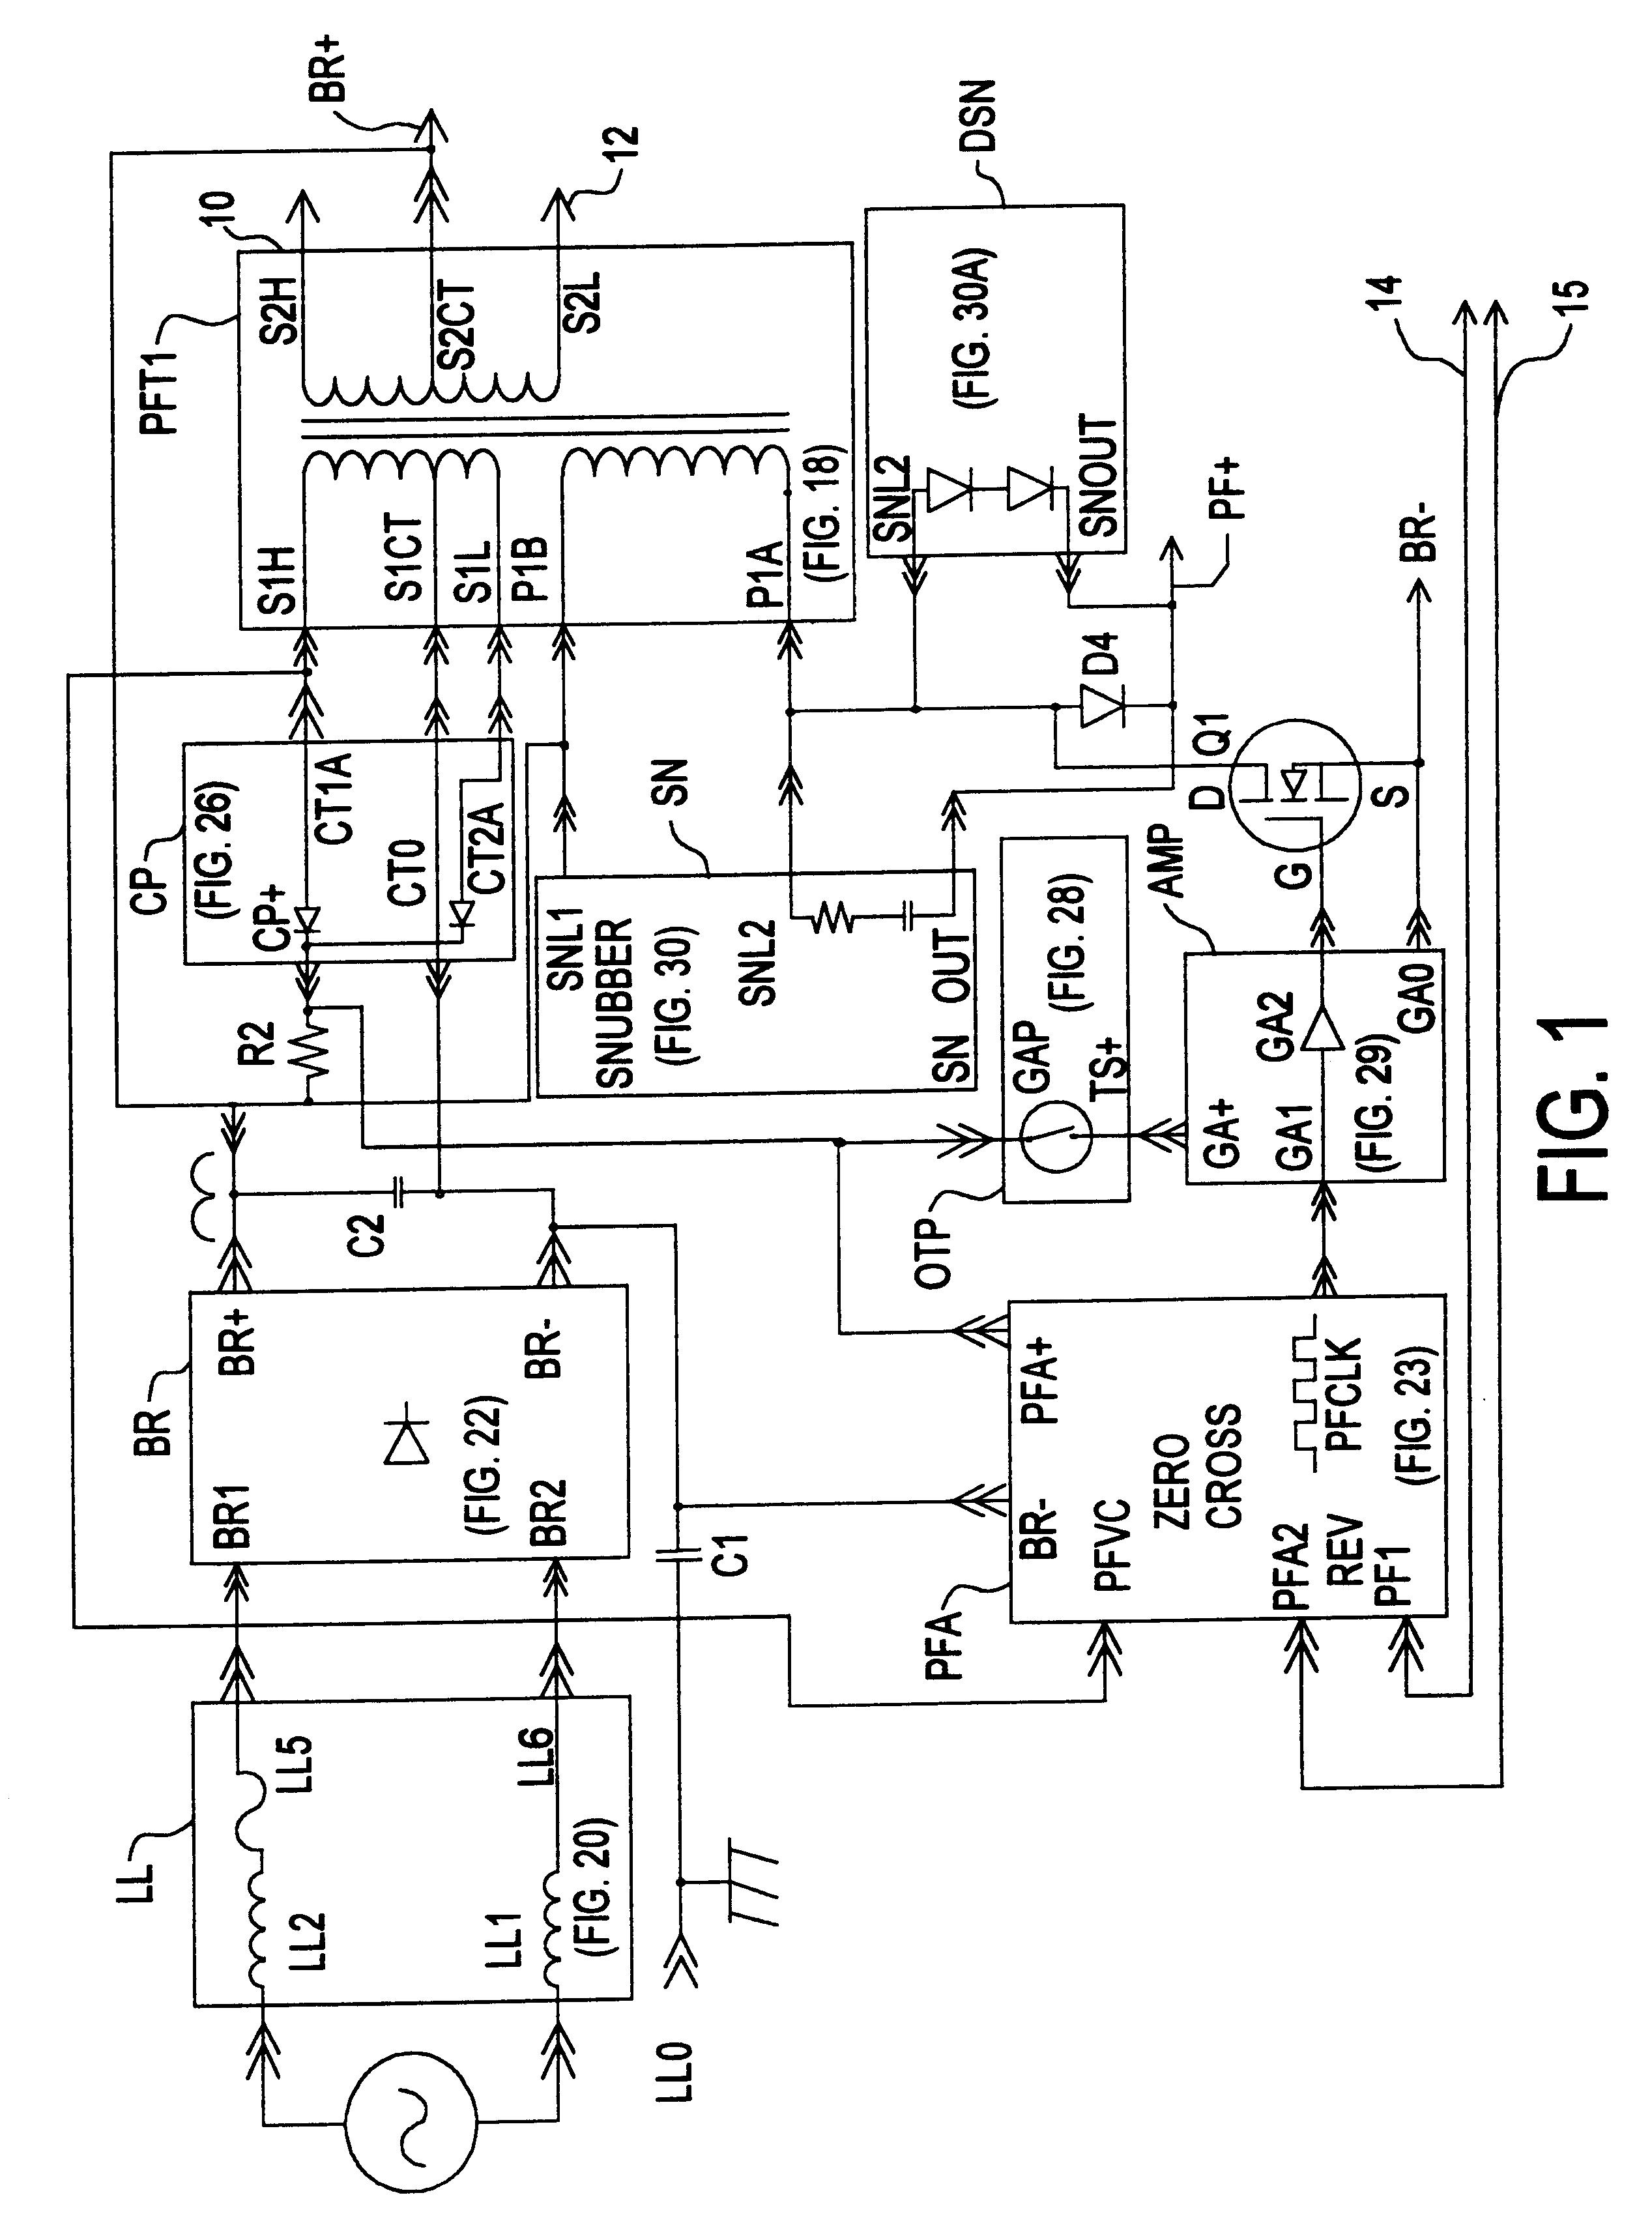 2001 dodge neon ke light wiring diagram 2001 dodge neon exhaust wiring diagram